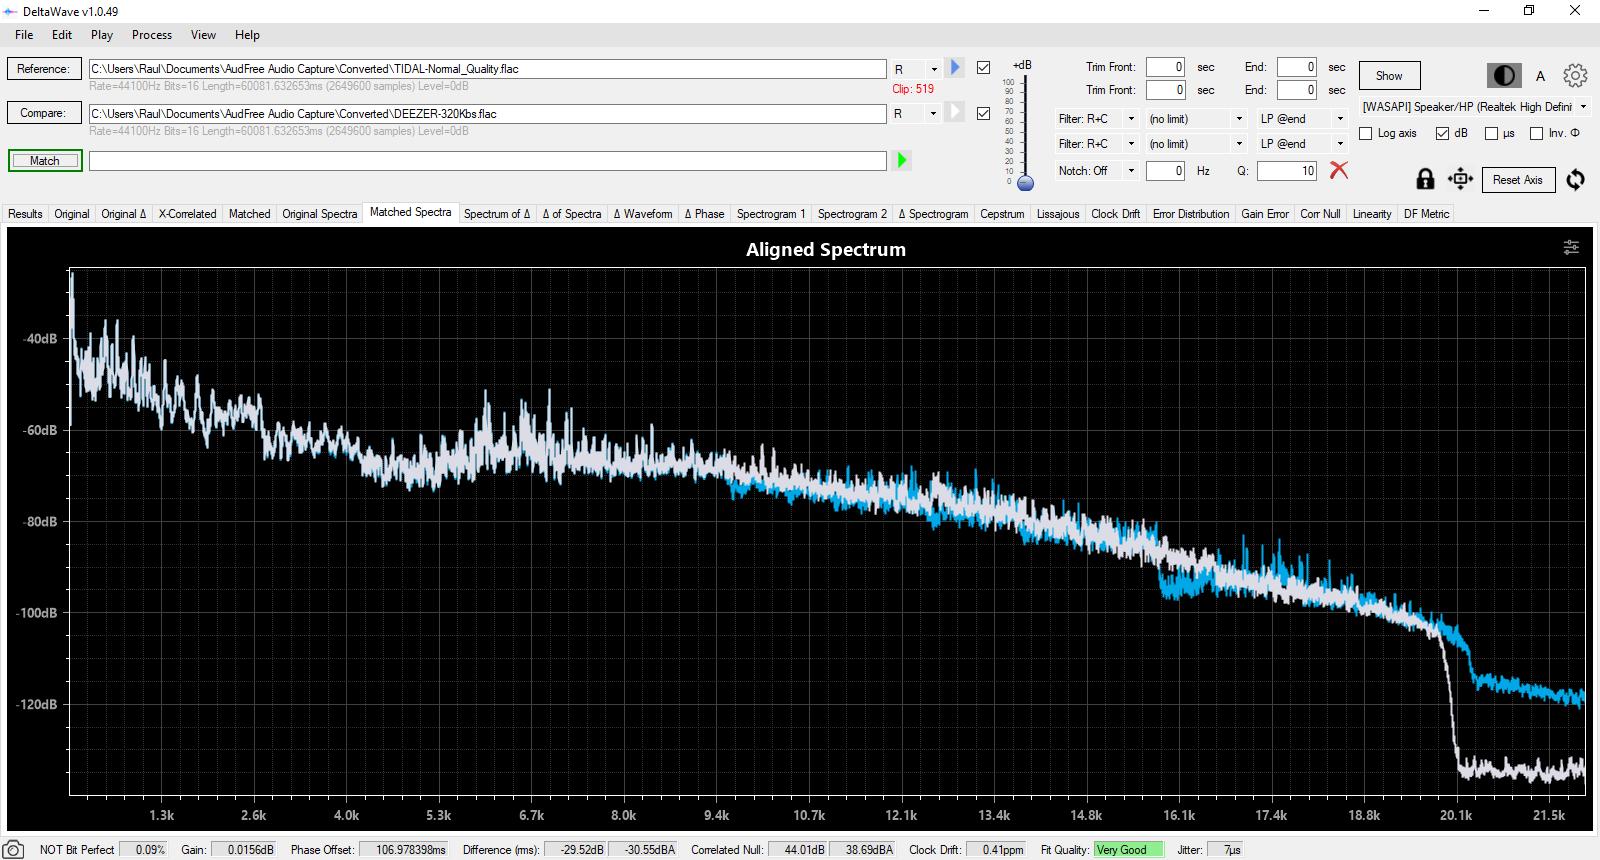 TIDAL_Normal_Quality_vs_DEEZER_320Kbs.png